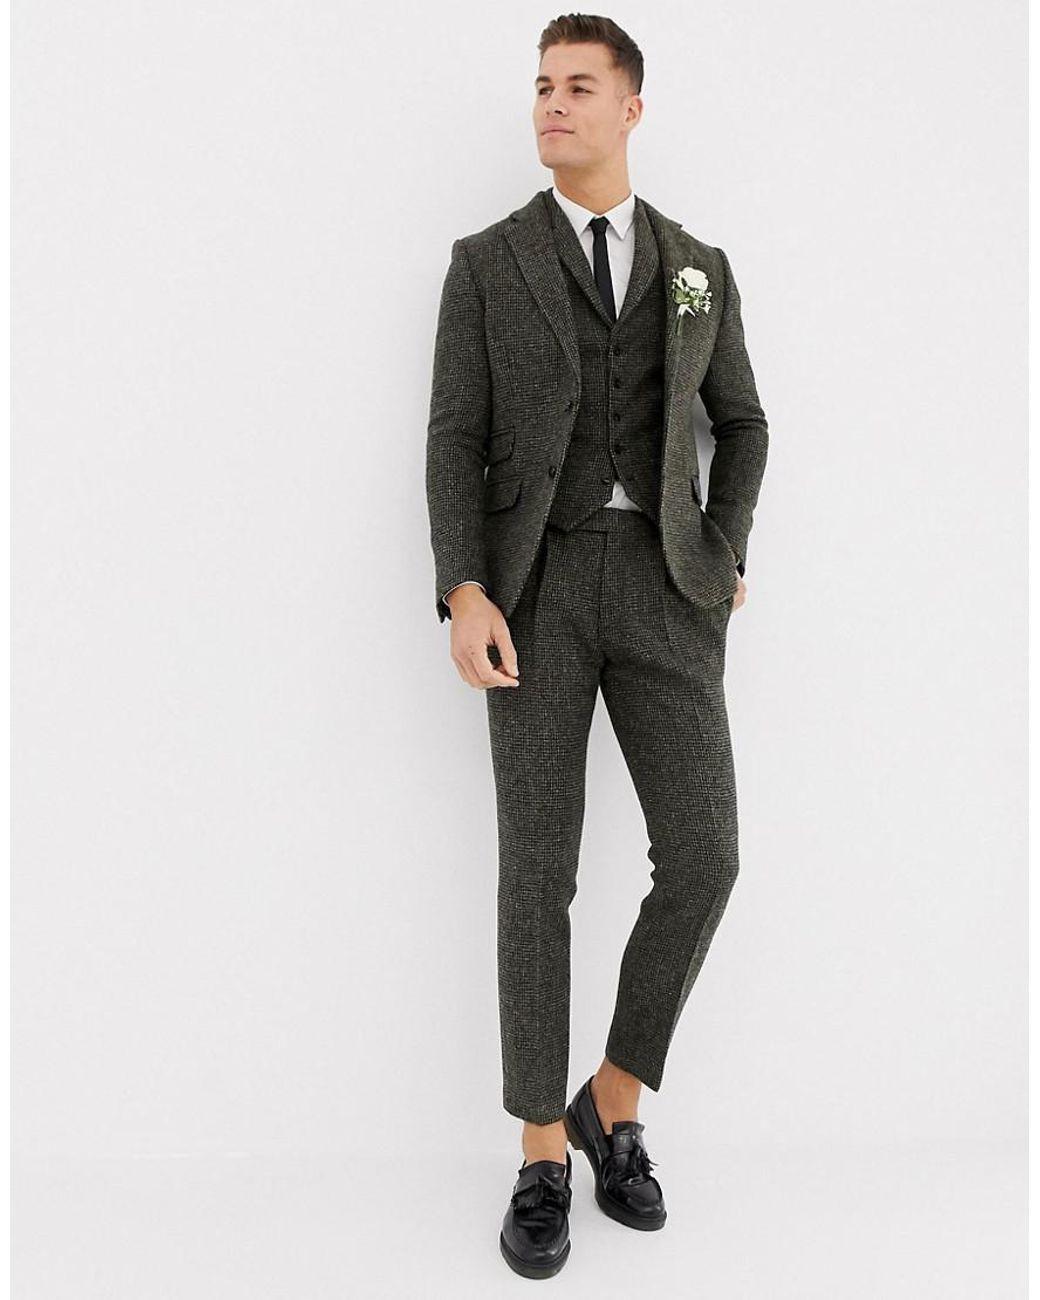 suit nam vải tweed